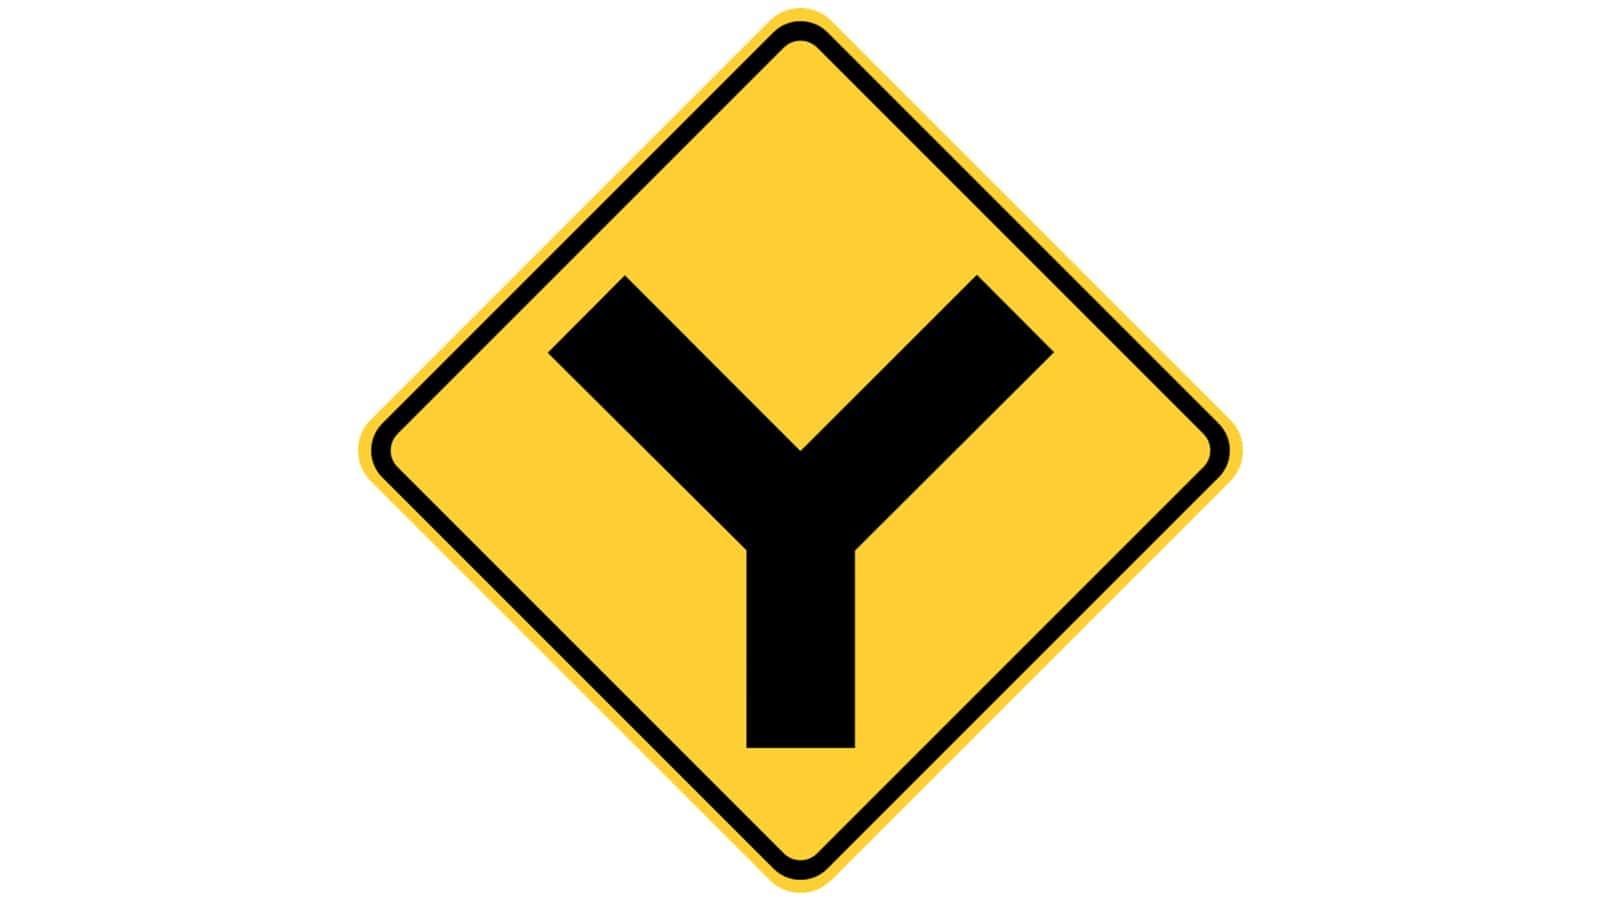 Warning sign Y-Roads